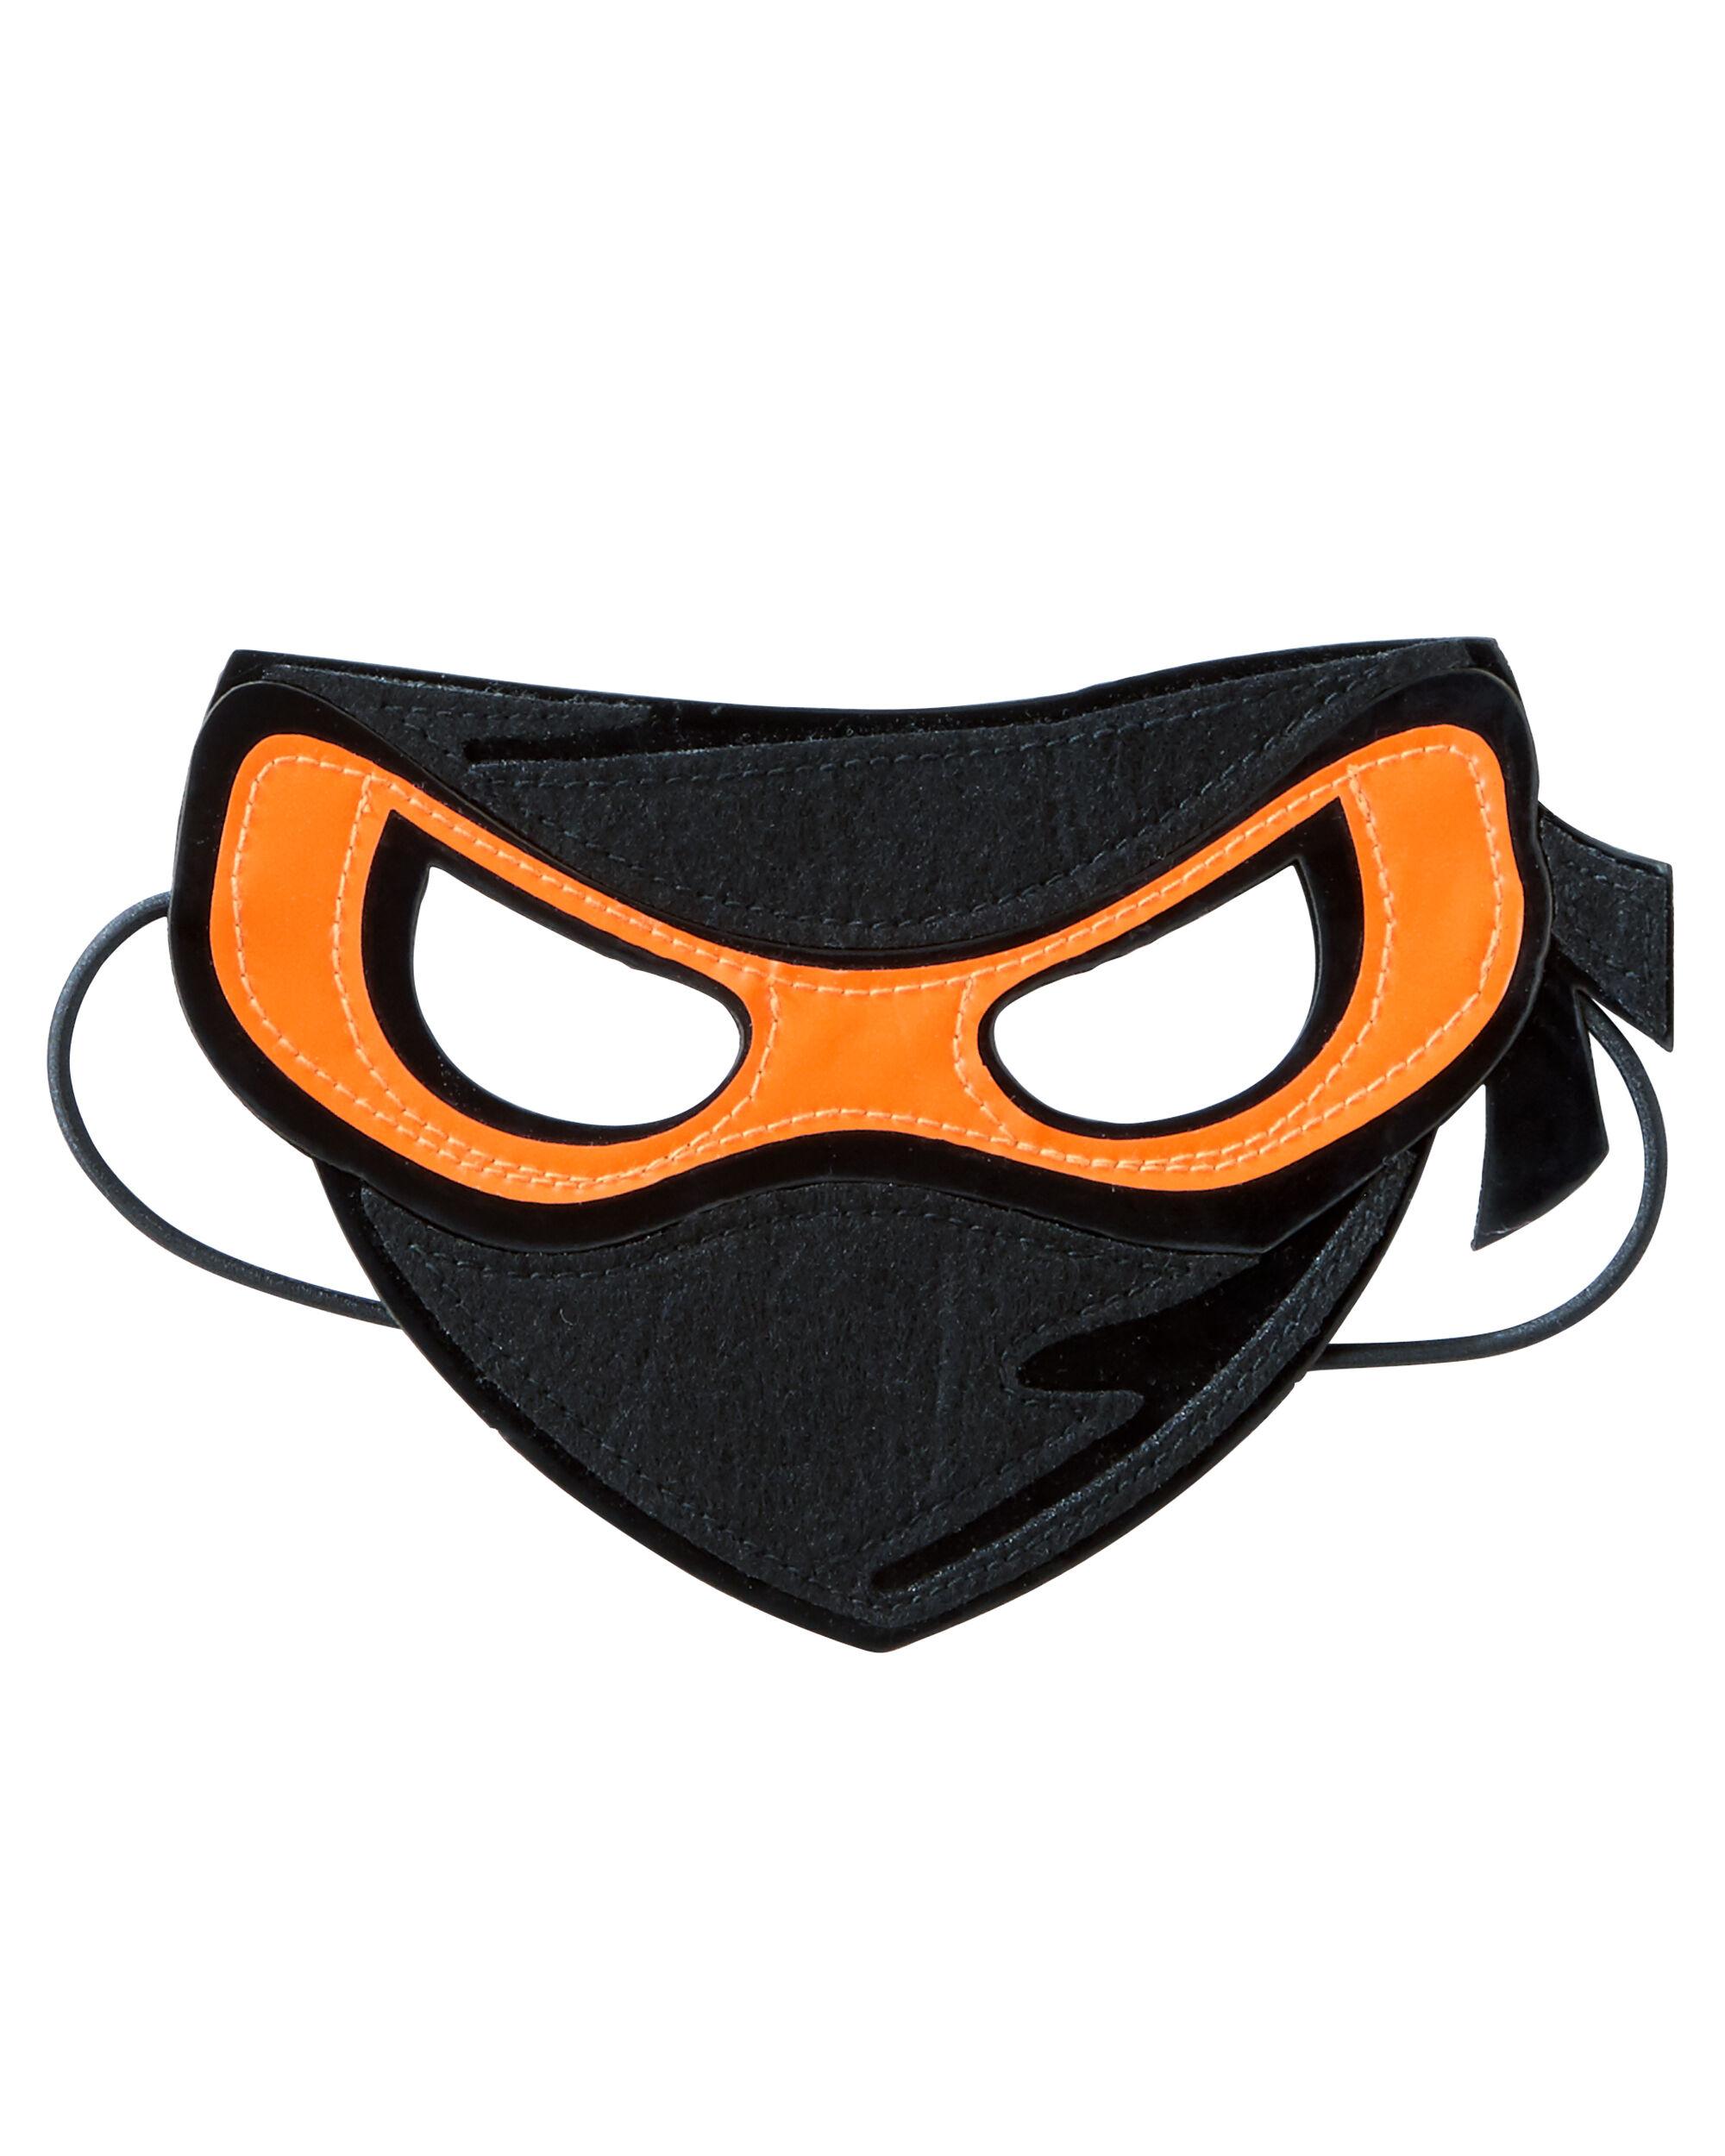 Glow-in-the-Dark Ninja Mask | OshKosh.com